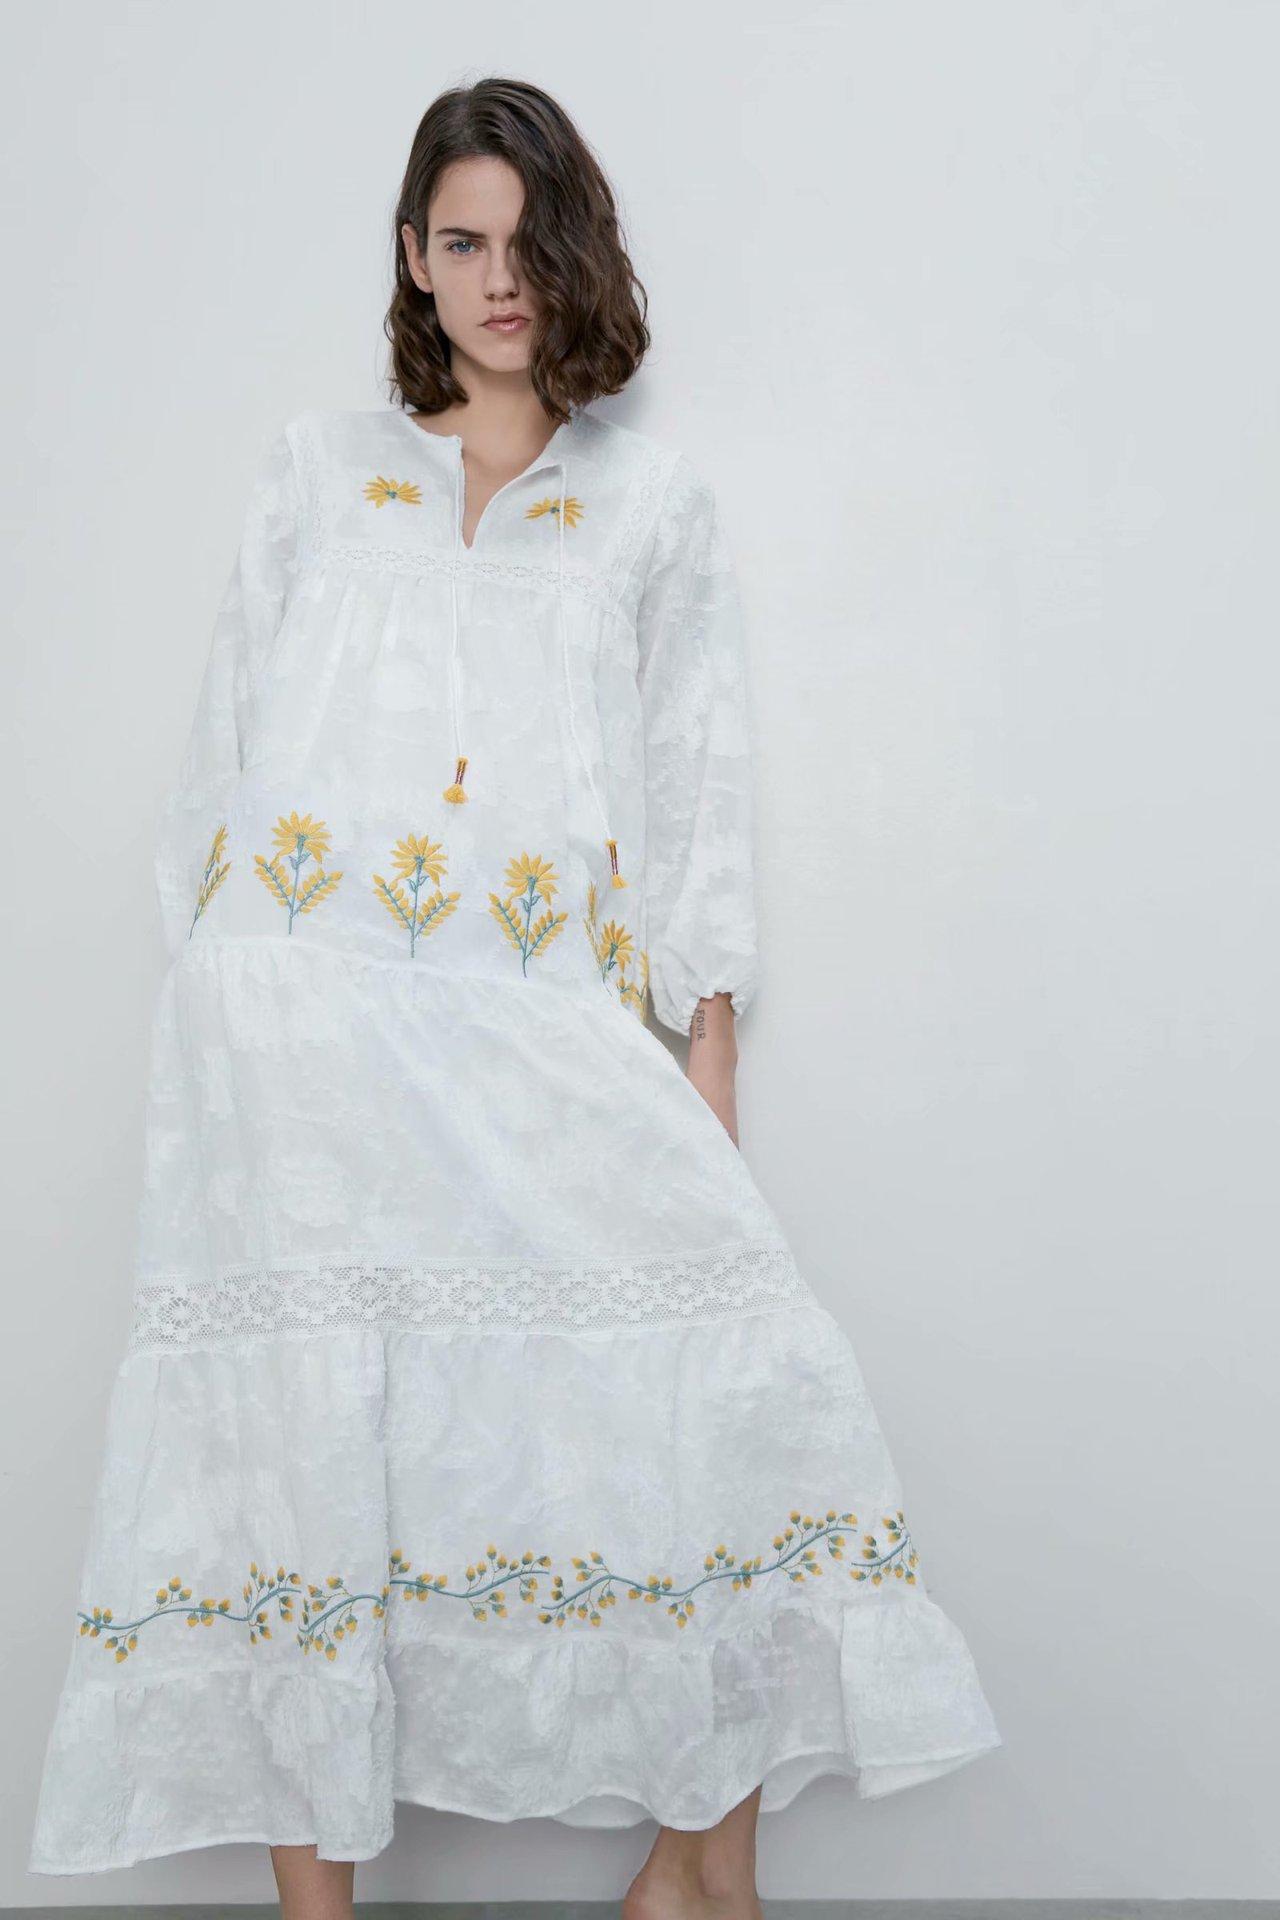 2020 new Spring Summer European Embroidered Long streetwear female Dress zaraing vadiming sheining Women dress maxi CDC9593